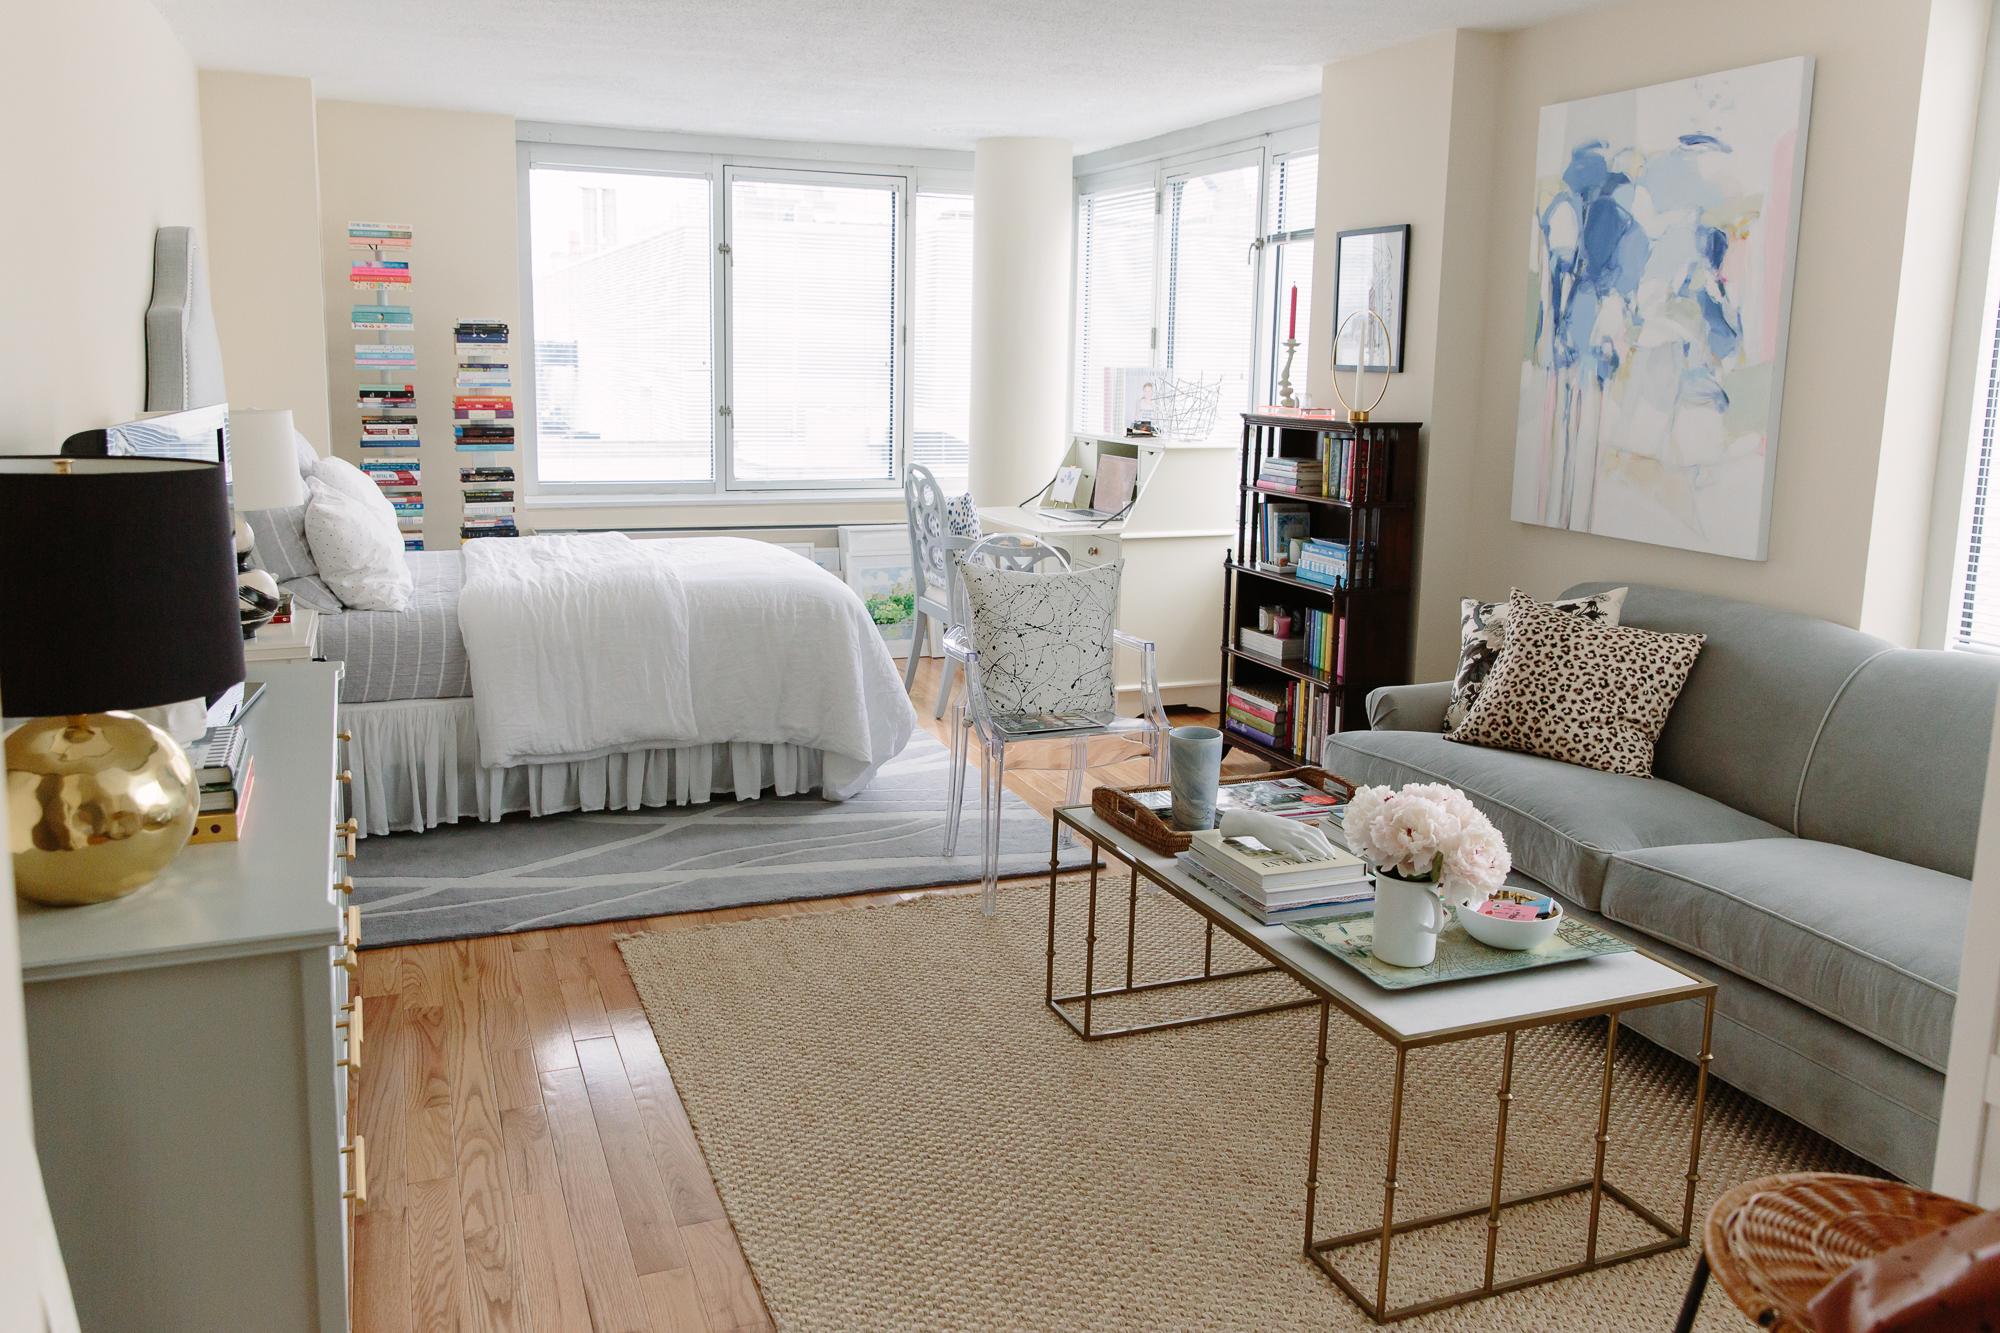 York avenue new york city based interior design and - How to design a studio apartment ...